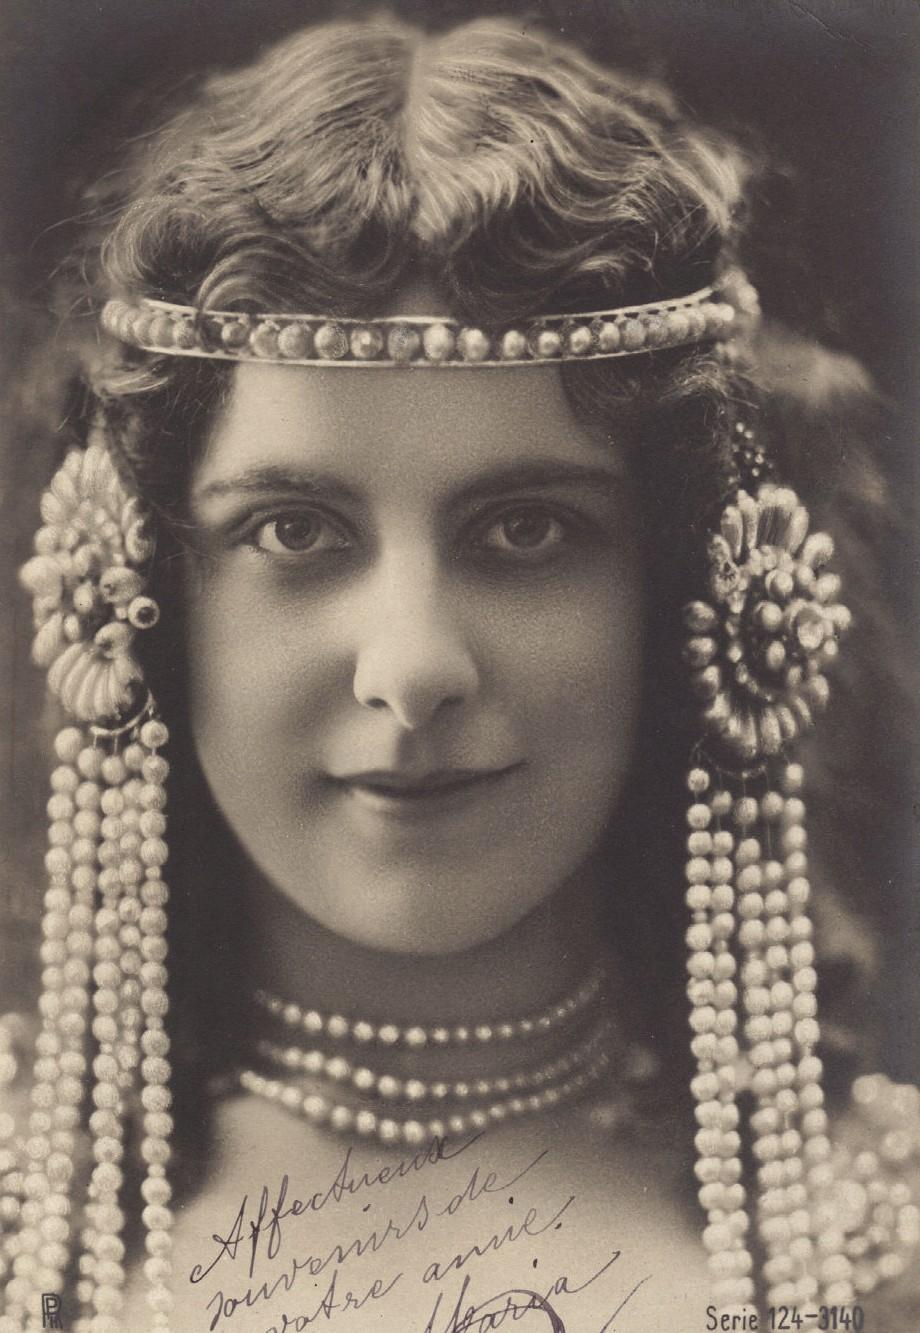 Http Mementomori Stock Deviantart Com Art Vintage Lady Miss Farrar 336004412